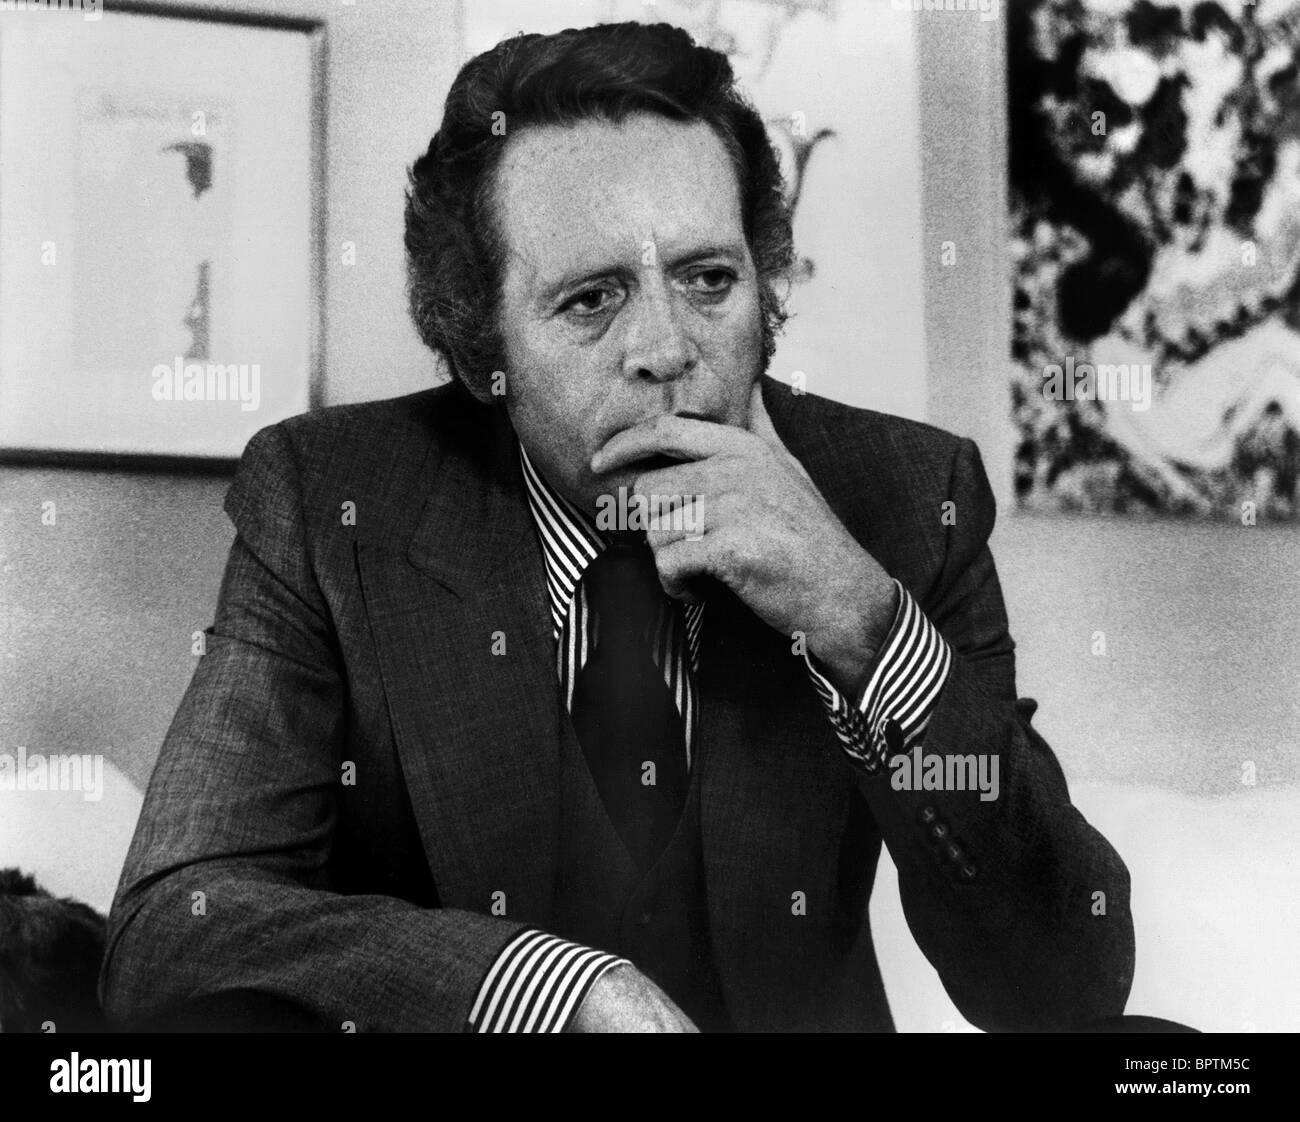 PATRICK MCGOOHAN SCHAUSPIELER (1978) Stockbild